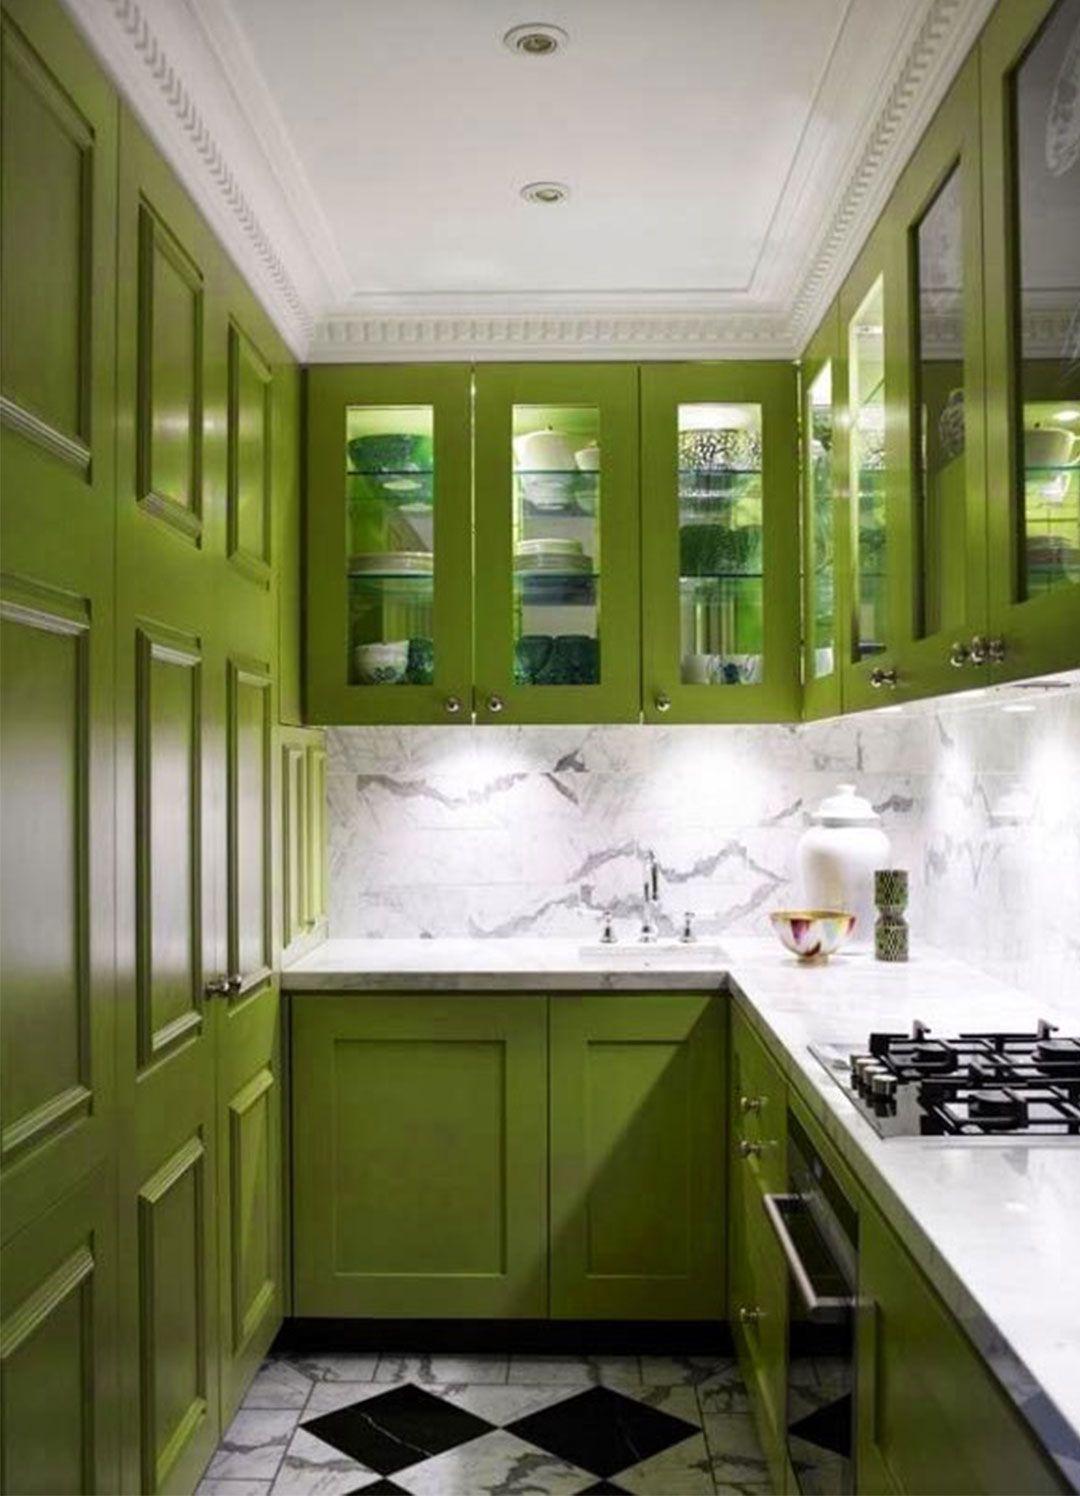 Captivating Green Kitchen Design Ideas Great Ideas